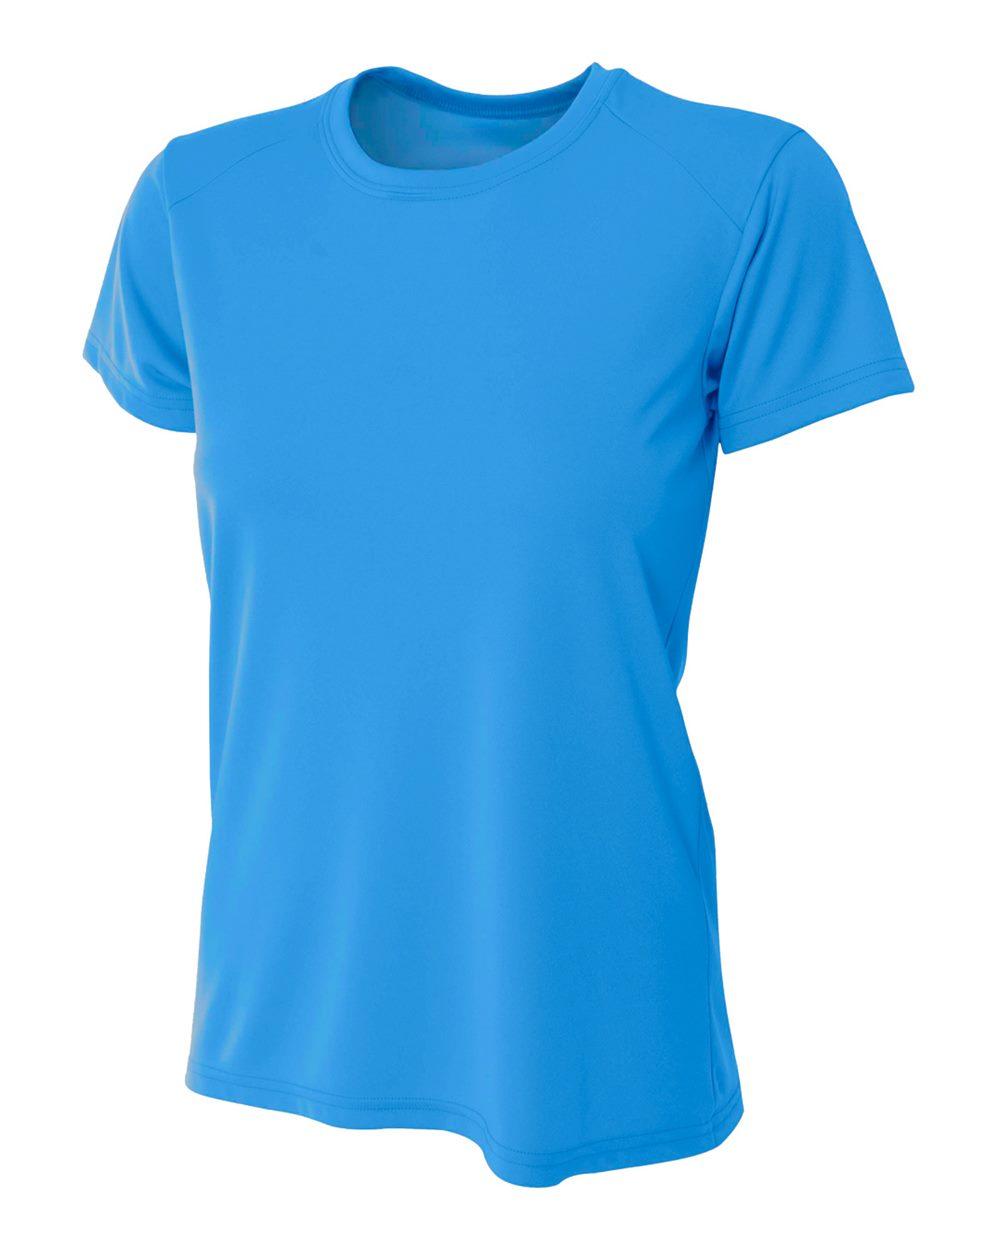 womens-polo-mwicking-electric-blue.jpg